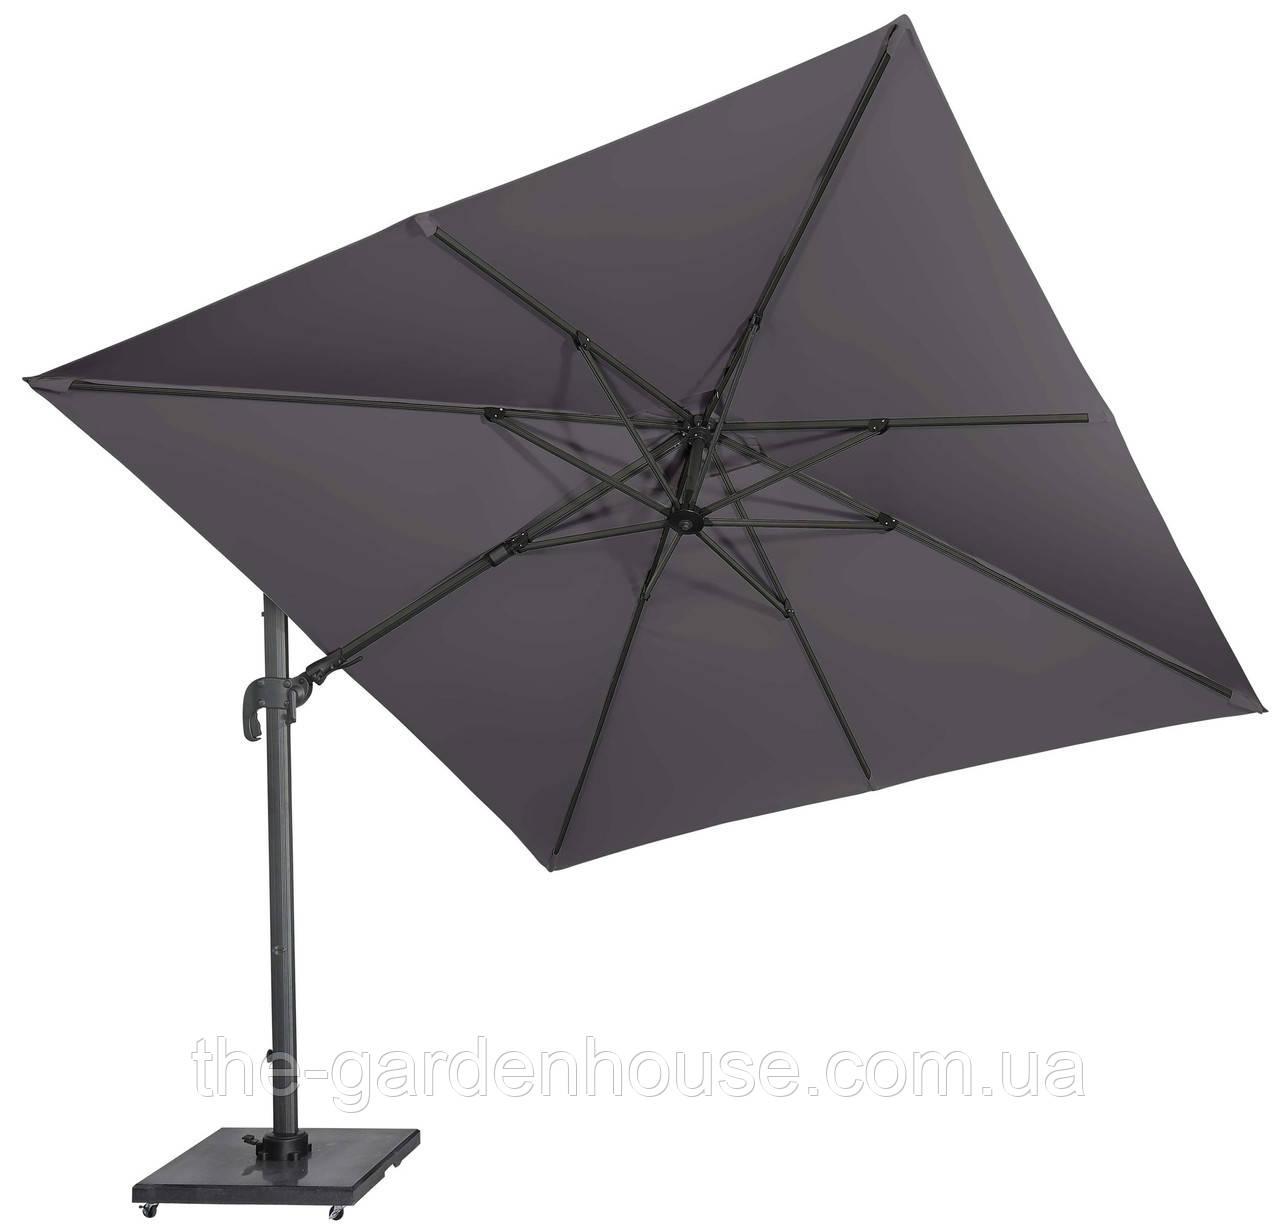 Садовый зонт с подсветкой Solarflex T2 3х3 м + подставка антрацит